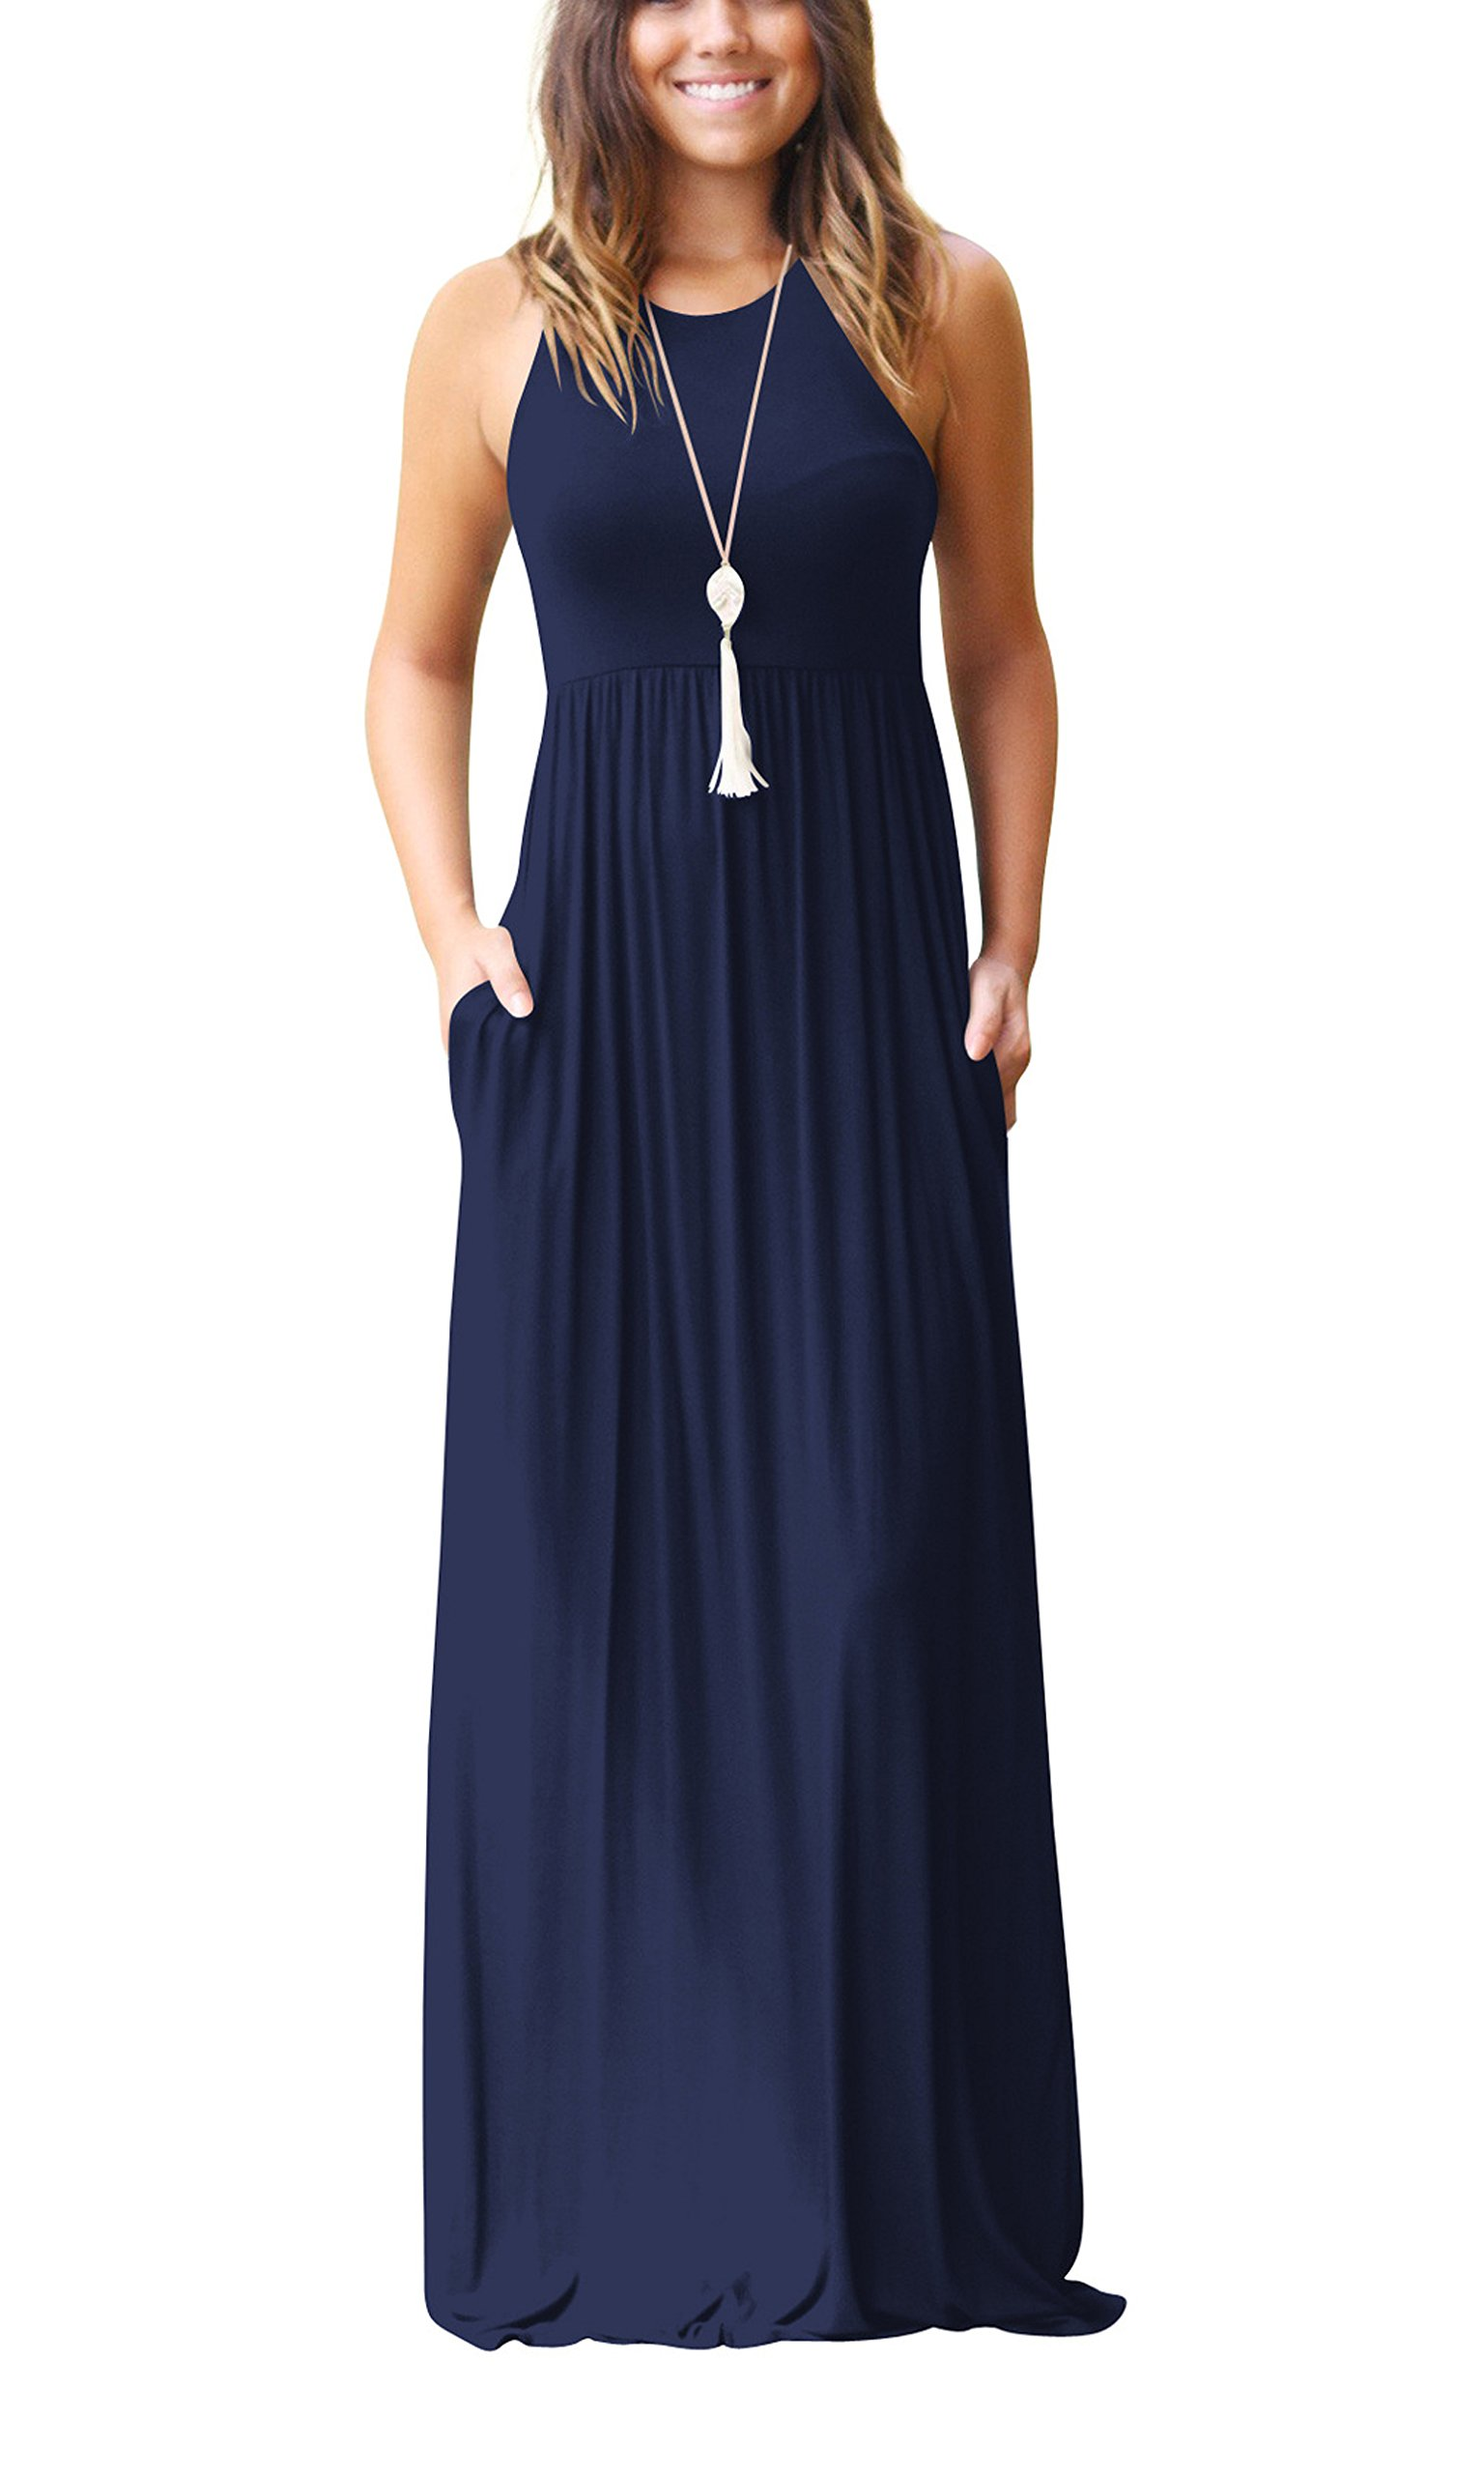 ZIKKER Women's Sleeveless Racerback Loose Plain Maxi Dresses Casual Long Dresses with Pockets Navy Blue S